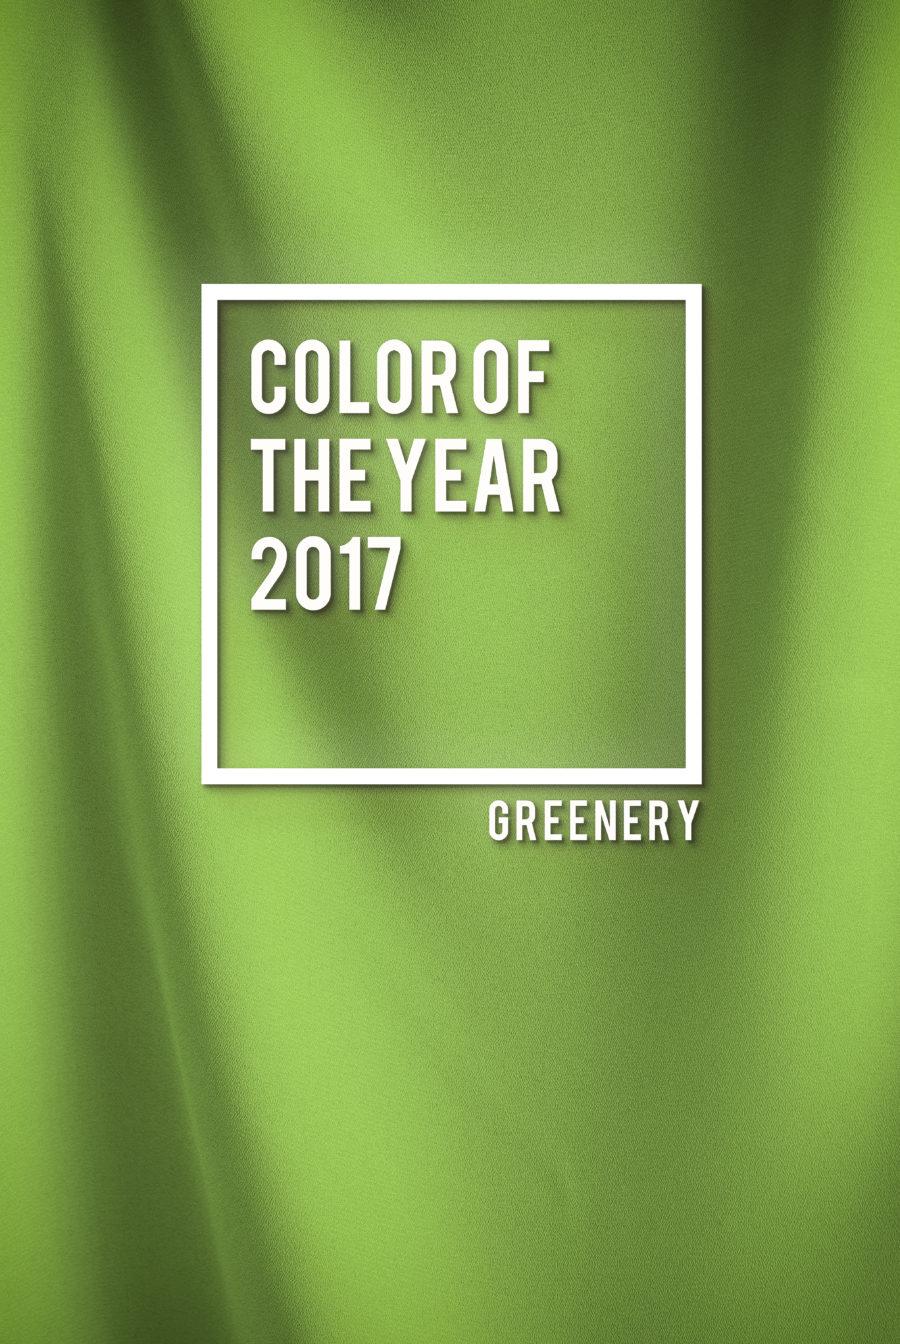 greenery farbe des jahres 2017 ana alcazar blog. Black Bedroom Furniture Sets. Home Design Ideas